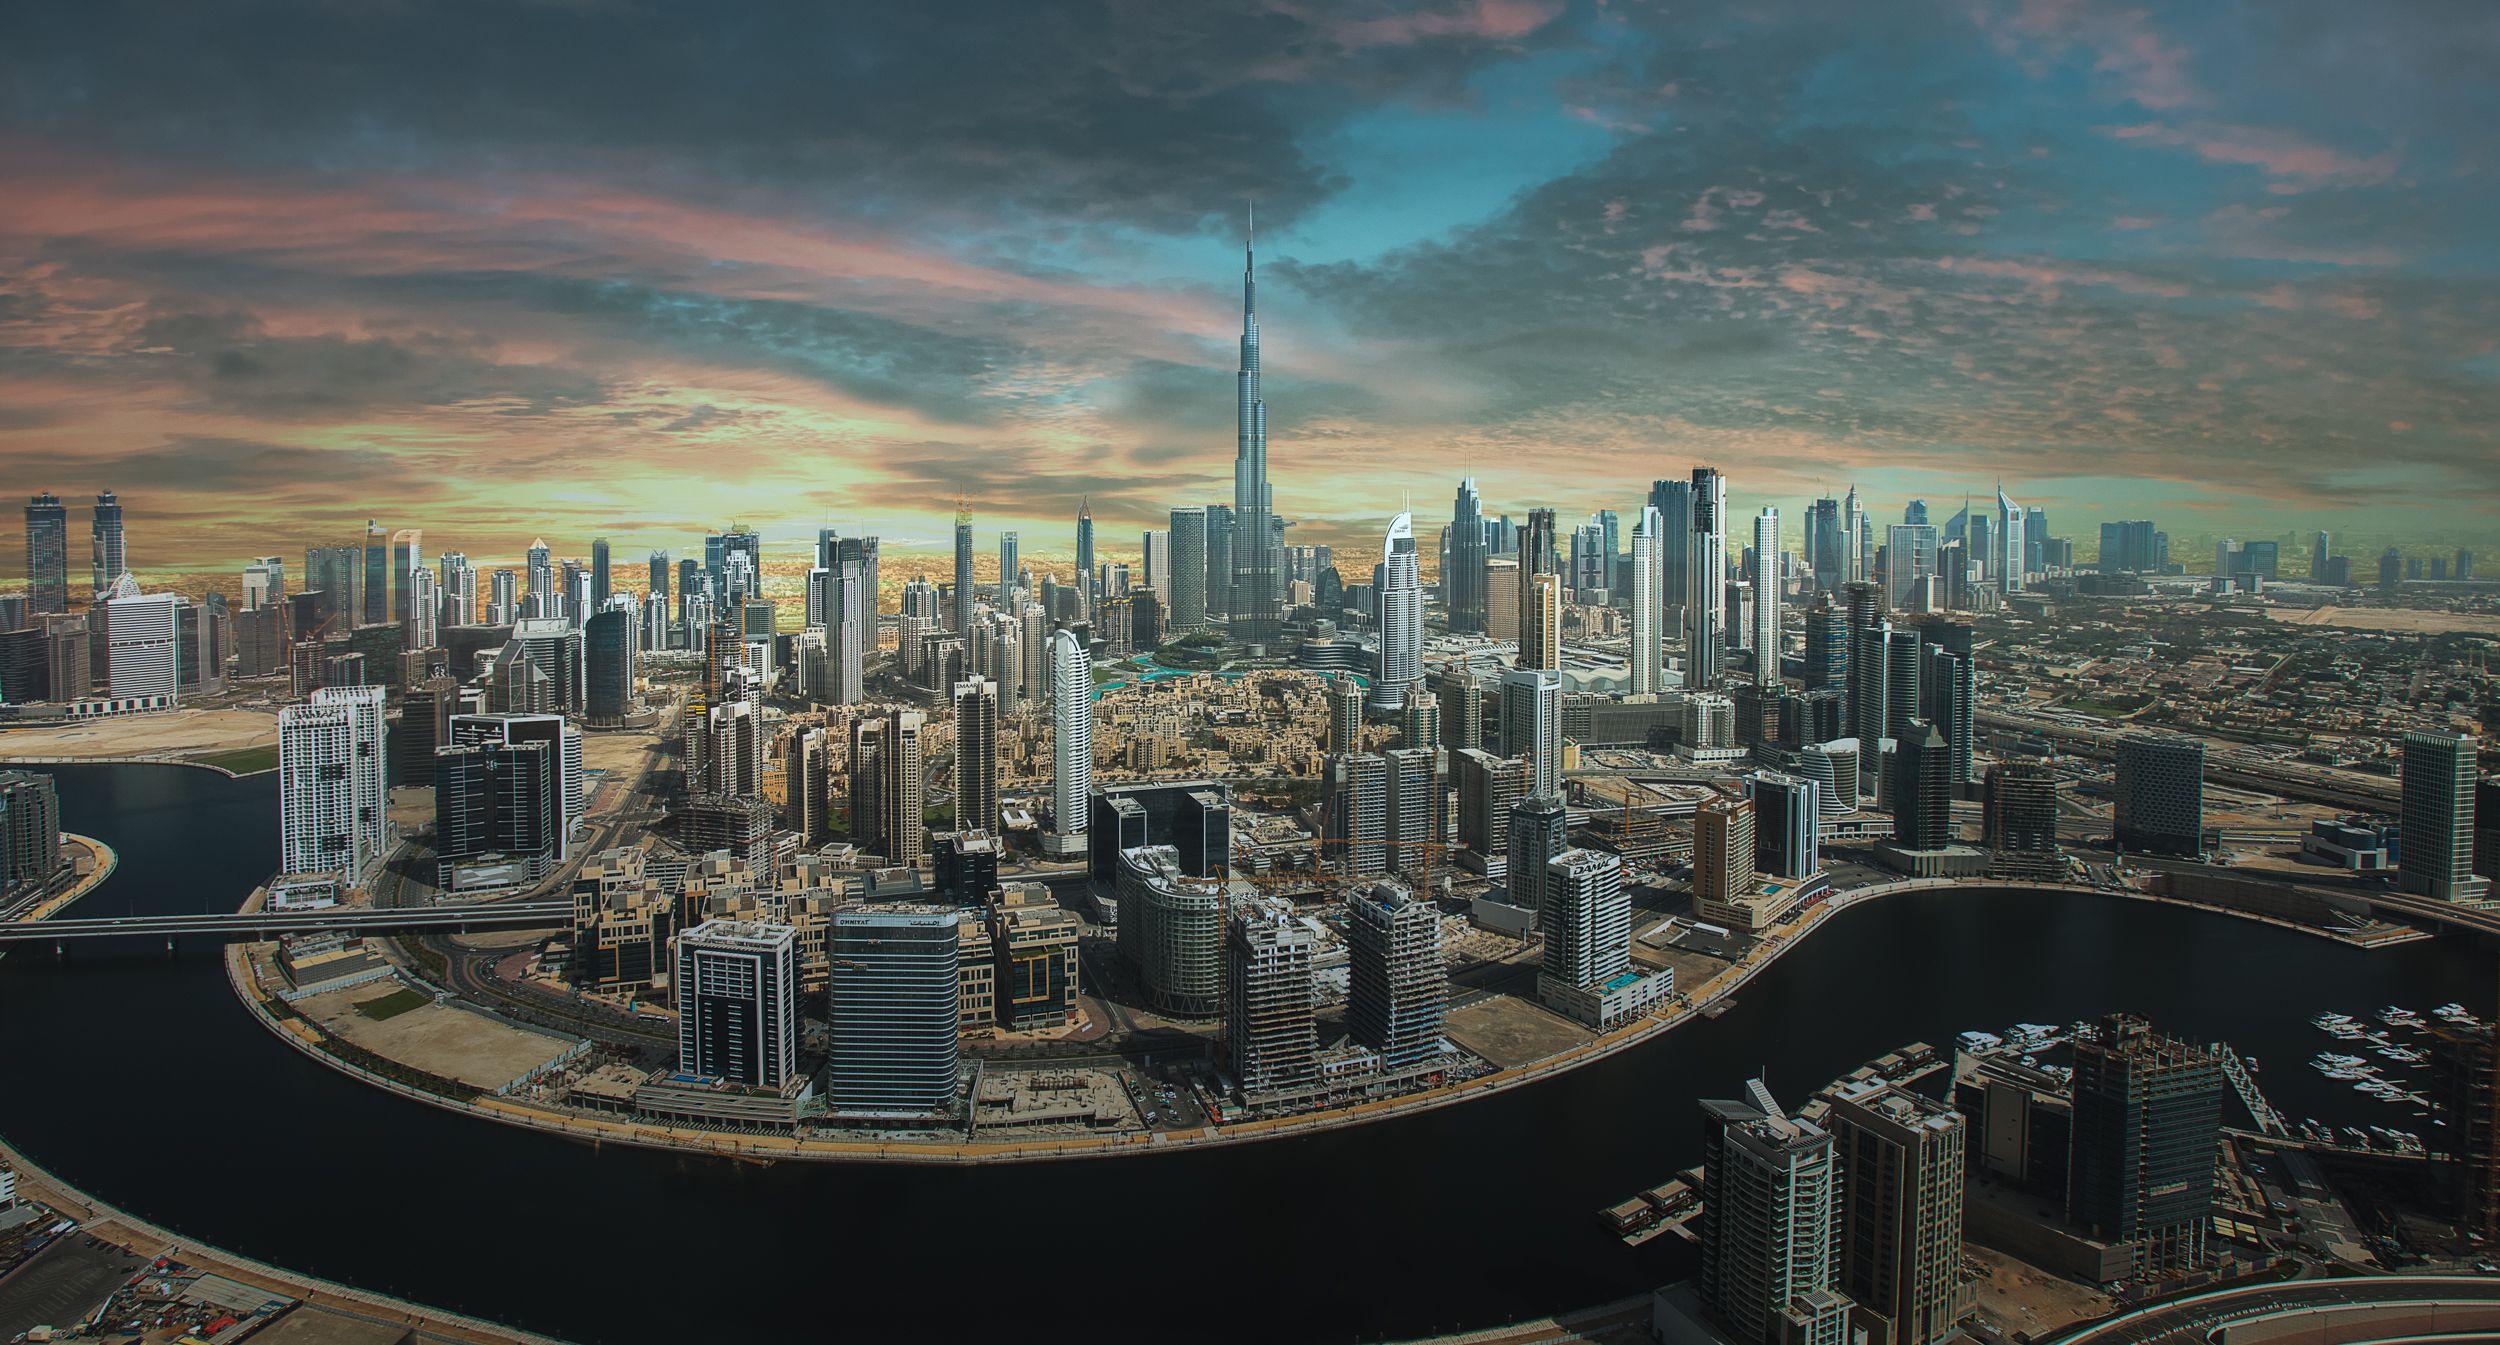 Dubai Drone Rental Abu Dhabi Drone Rental-05_079A1633-Edit-3.jpg